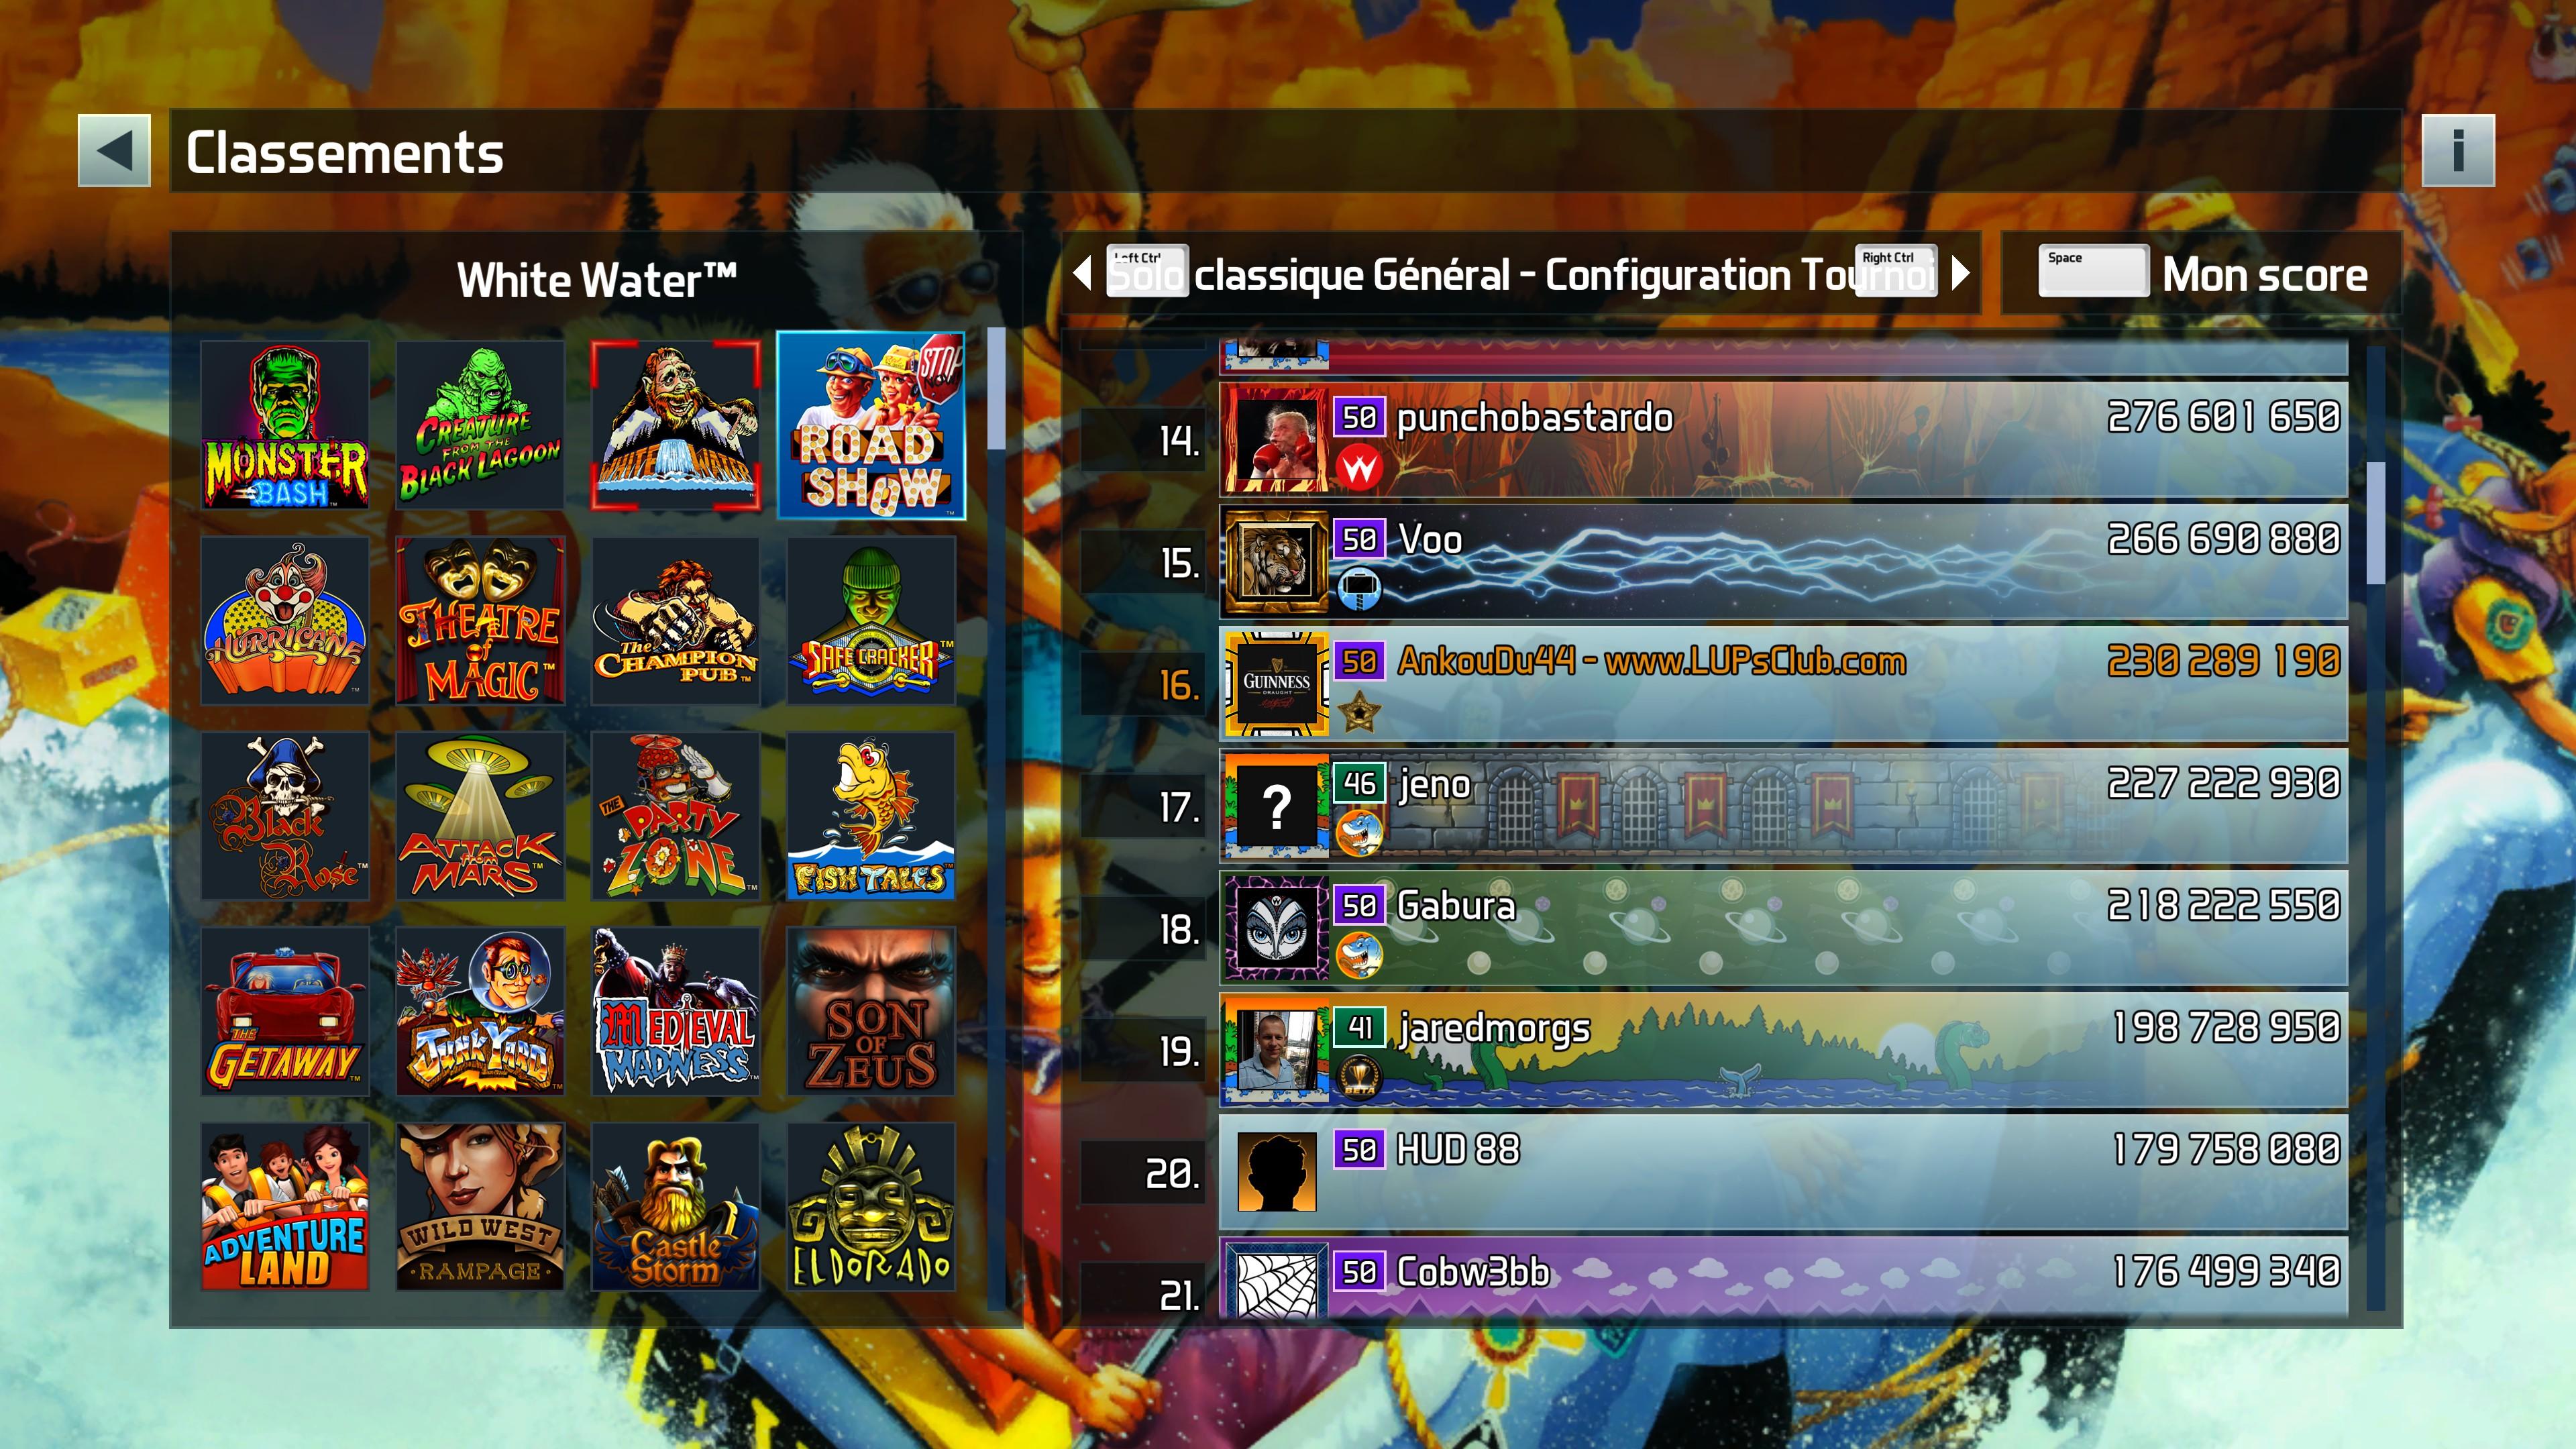 Williams Pinball : Les records du LUP's Club en mode Classique (arcade et tournoi) - Page 5 EF4662C5846FC19CB4EFDFED3E5FA92737C6FE24